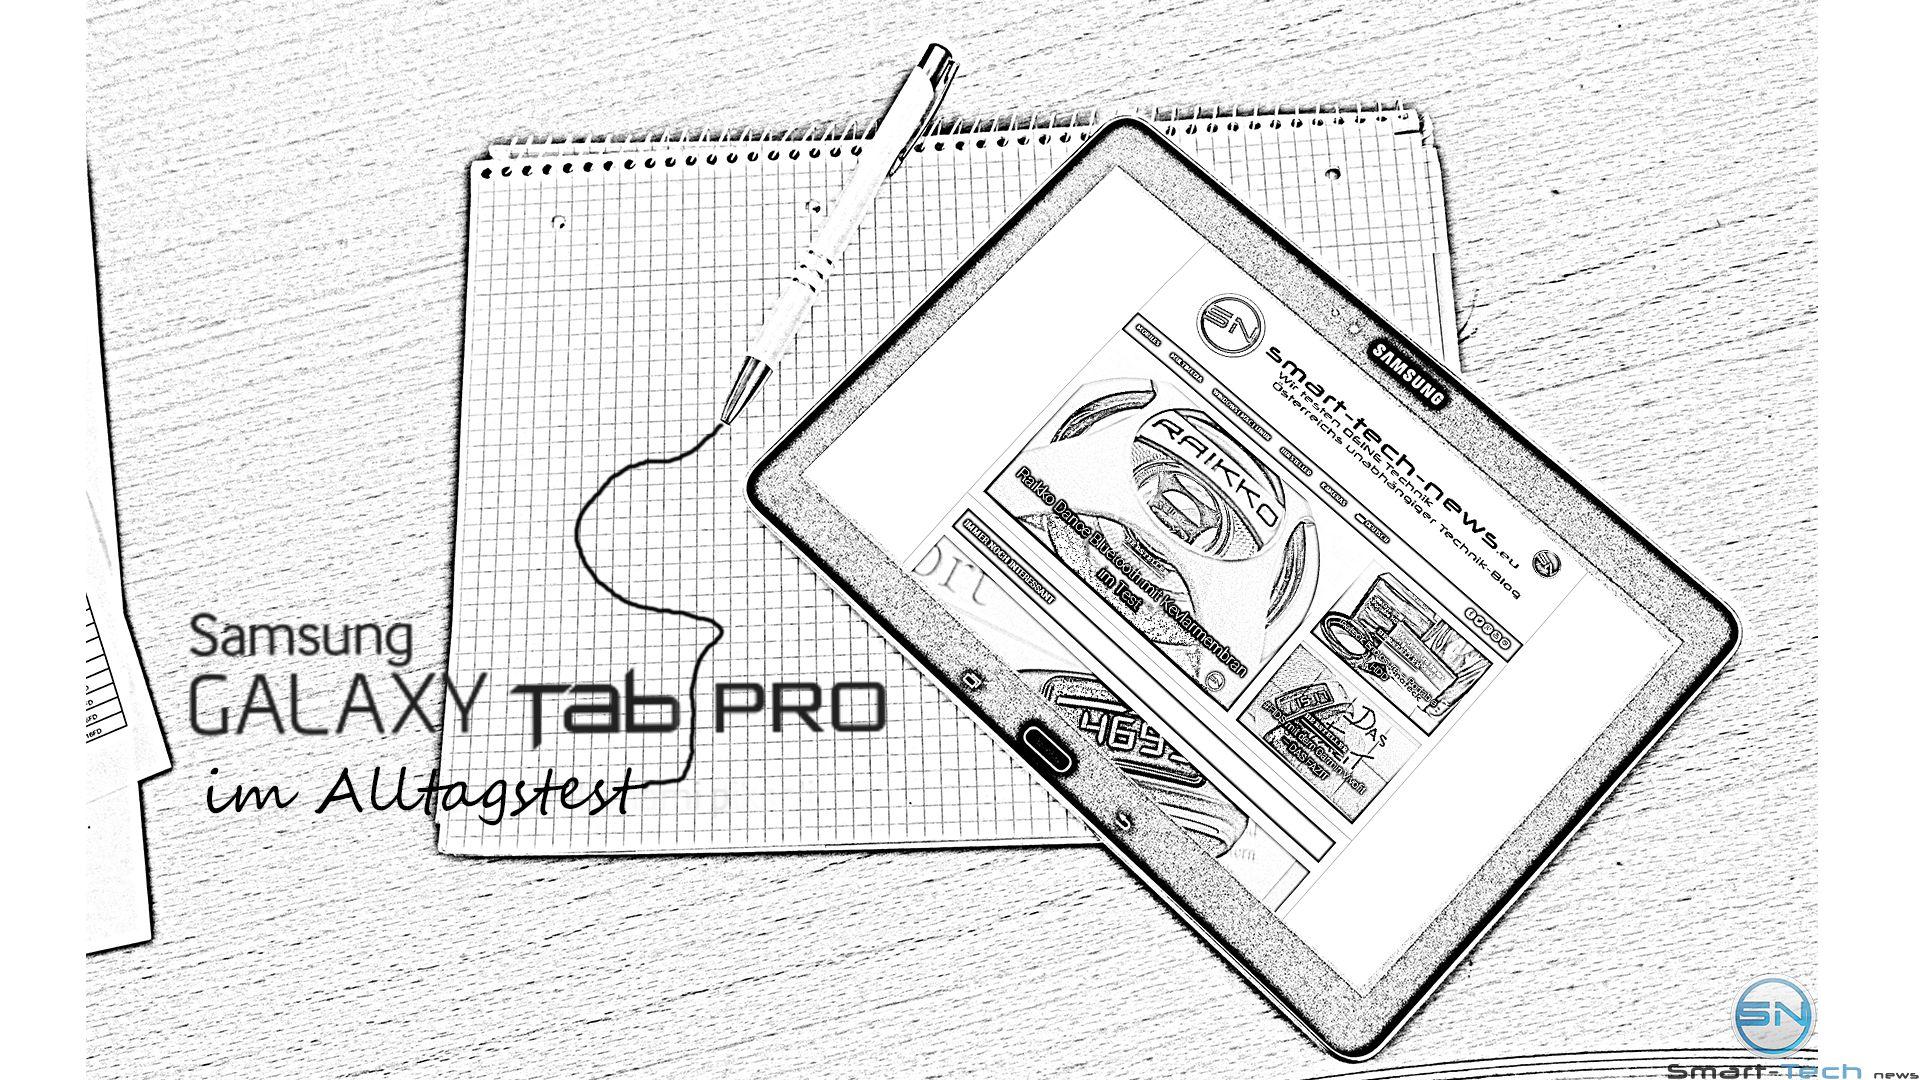 Samsung Galaxy Tab Pro (SM-T520) im Alltags-Office Test